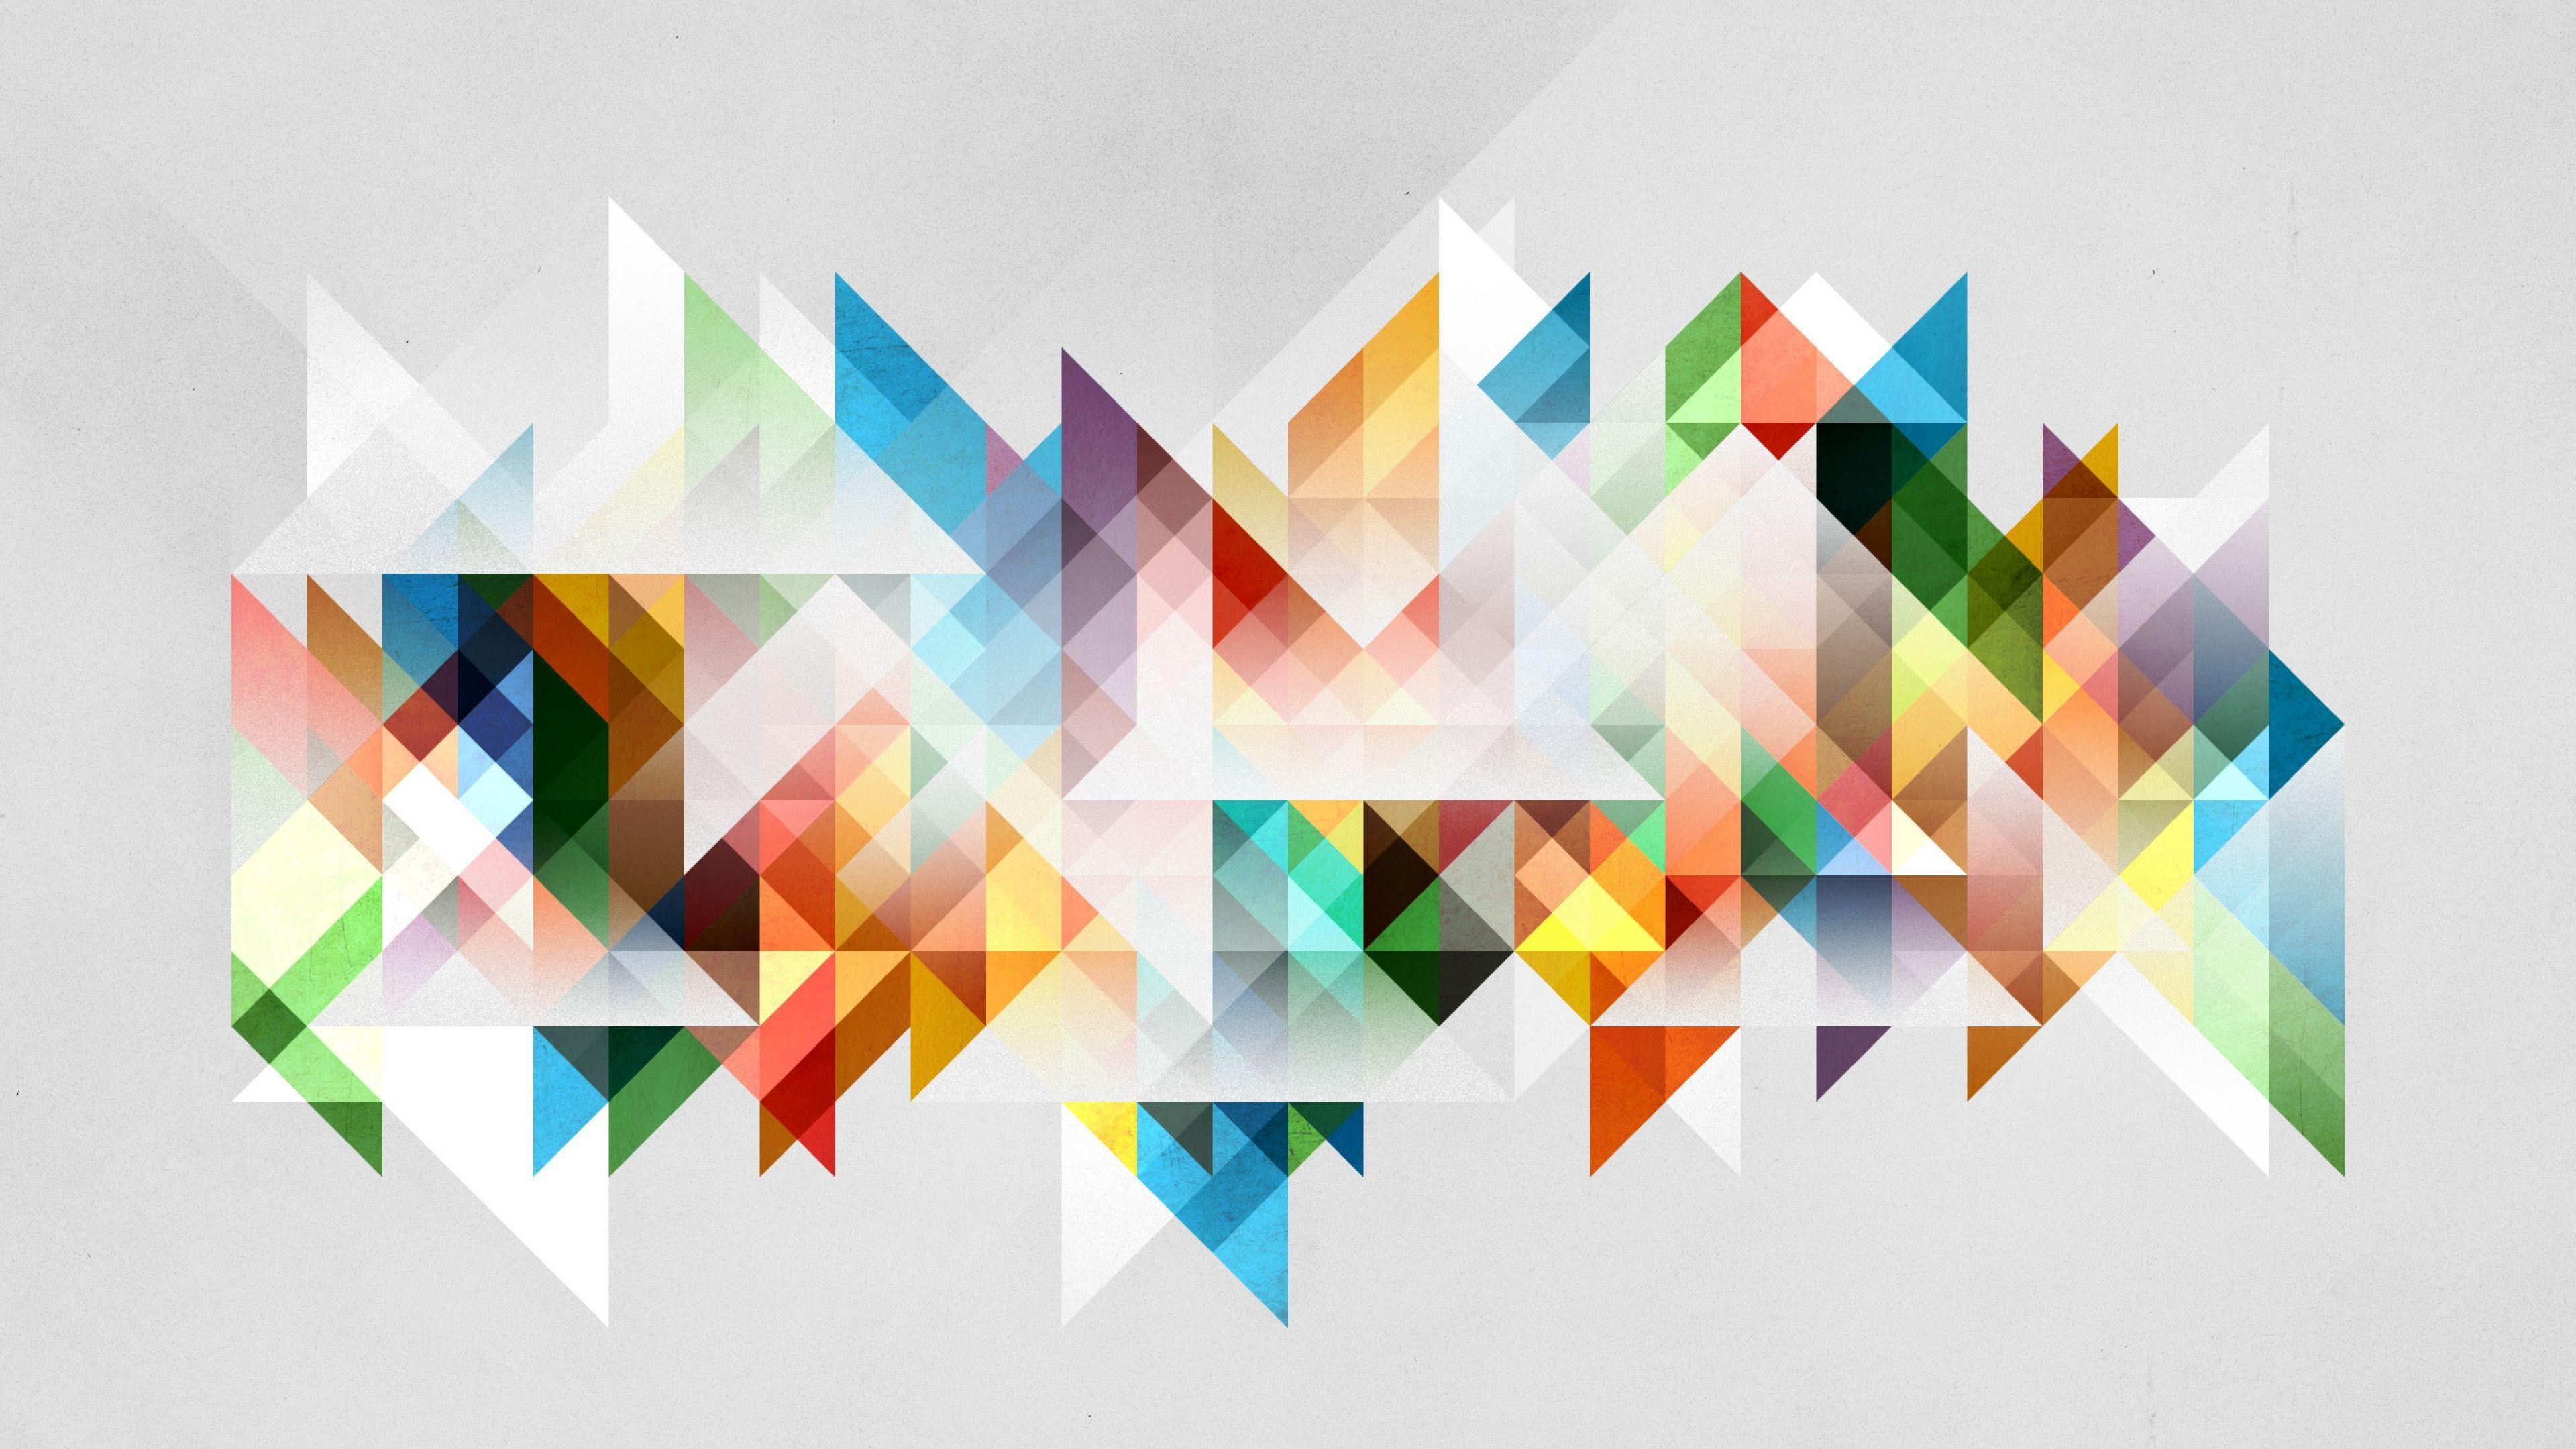 4k Geometric Wallpapers Top Free 4k Geometric Backgrounds Wallpaperaccess Abstract Art Wallpaper Abstract Wallpaper